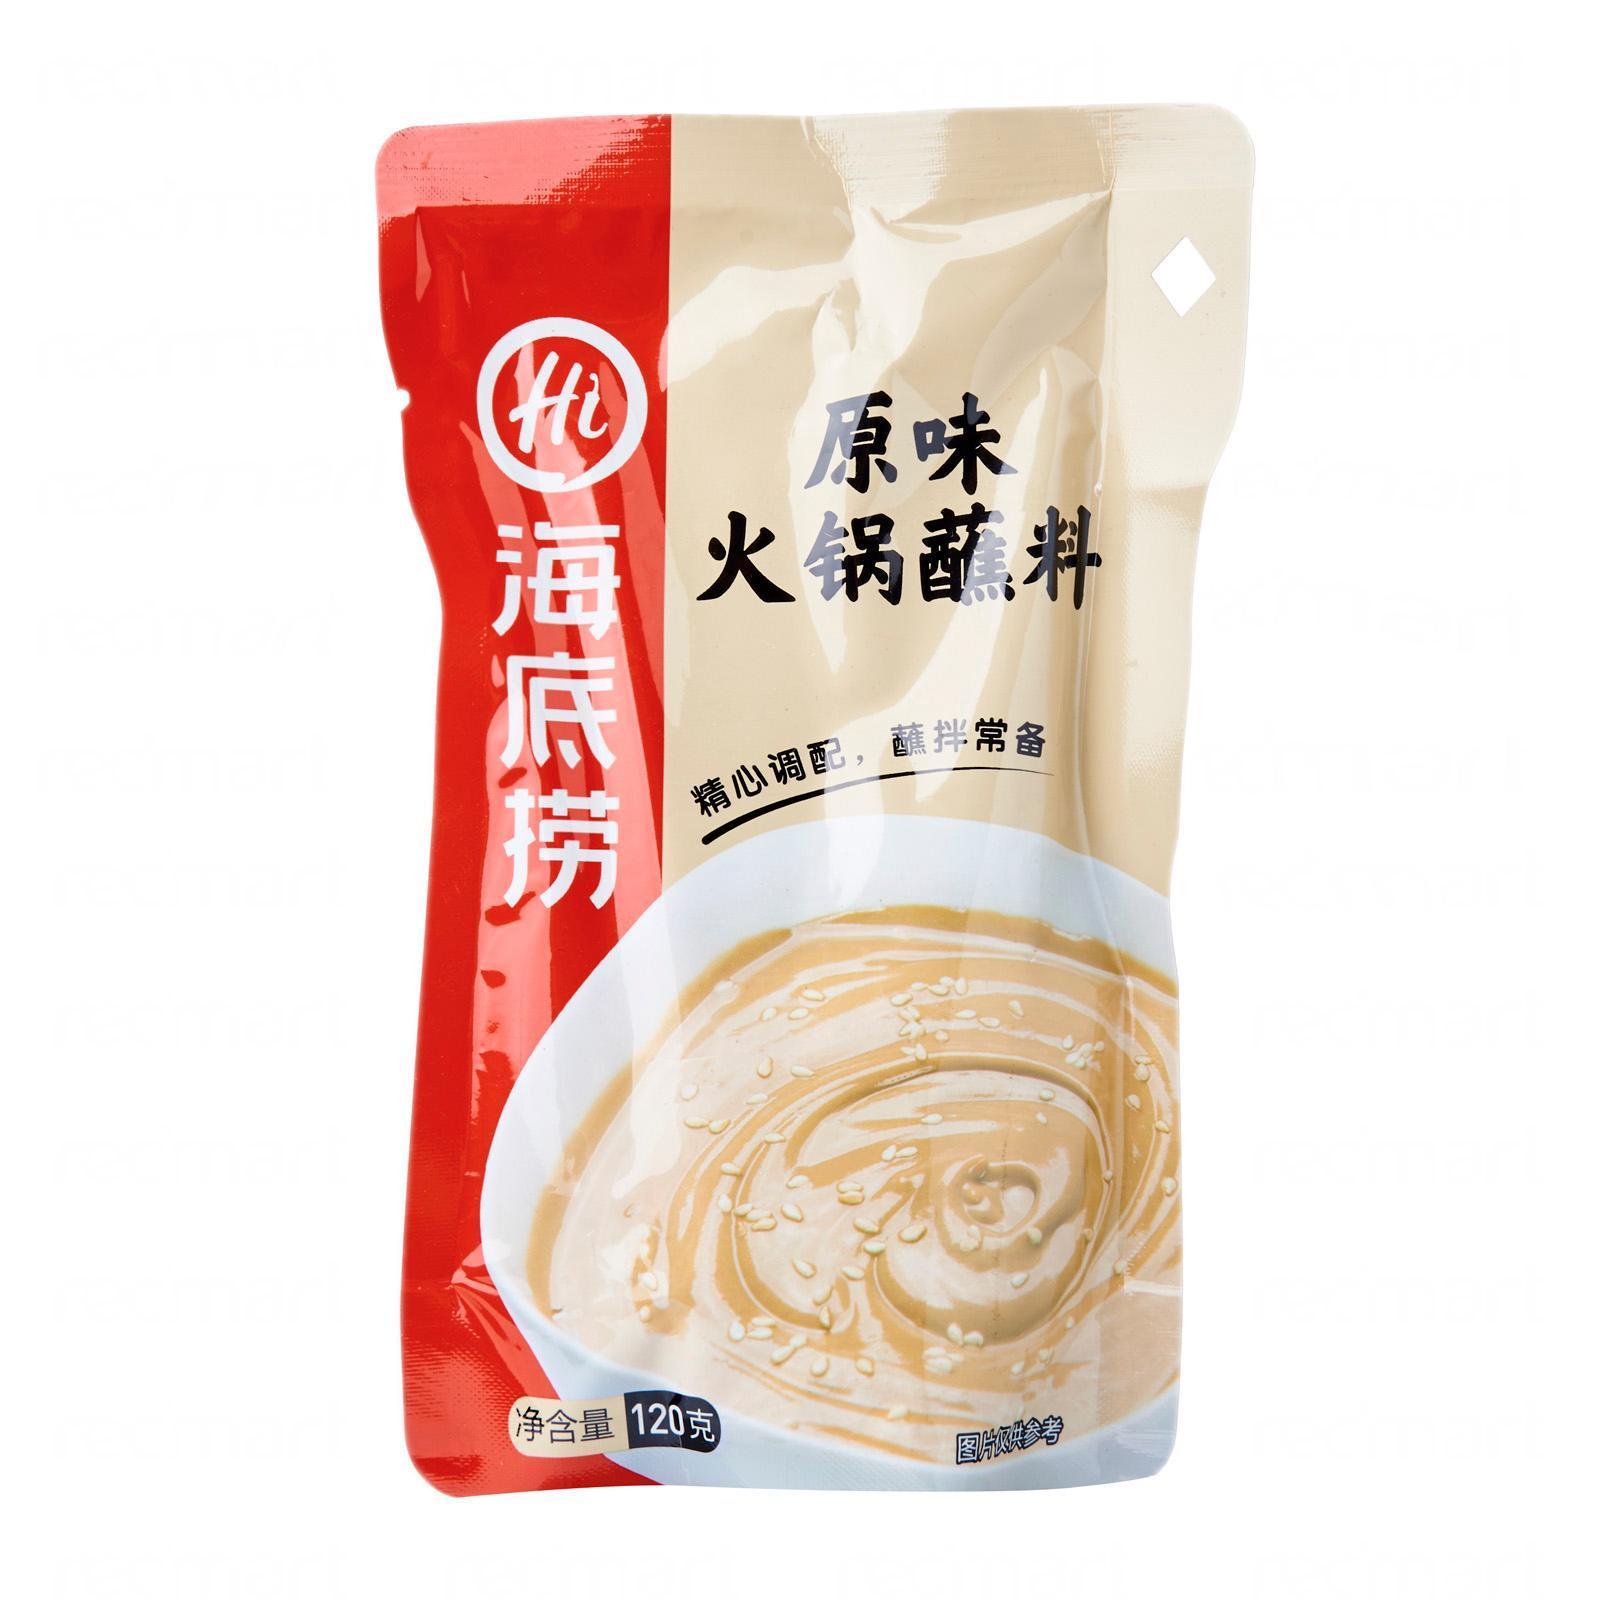 Hai Di Lao Original Sauce - By FOOD SERVICE